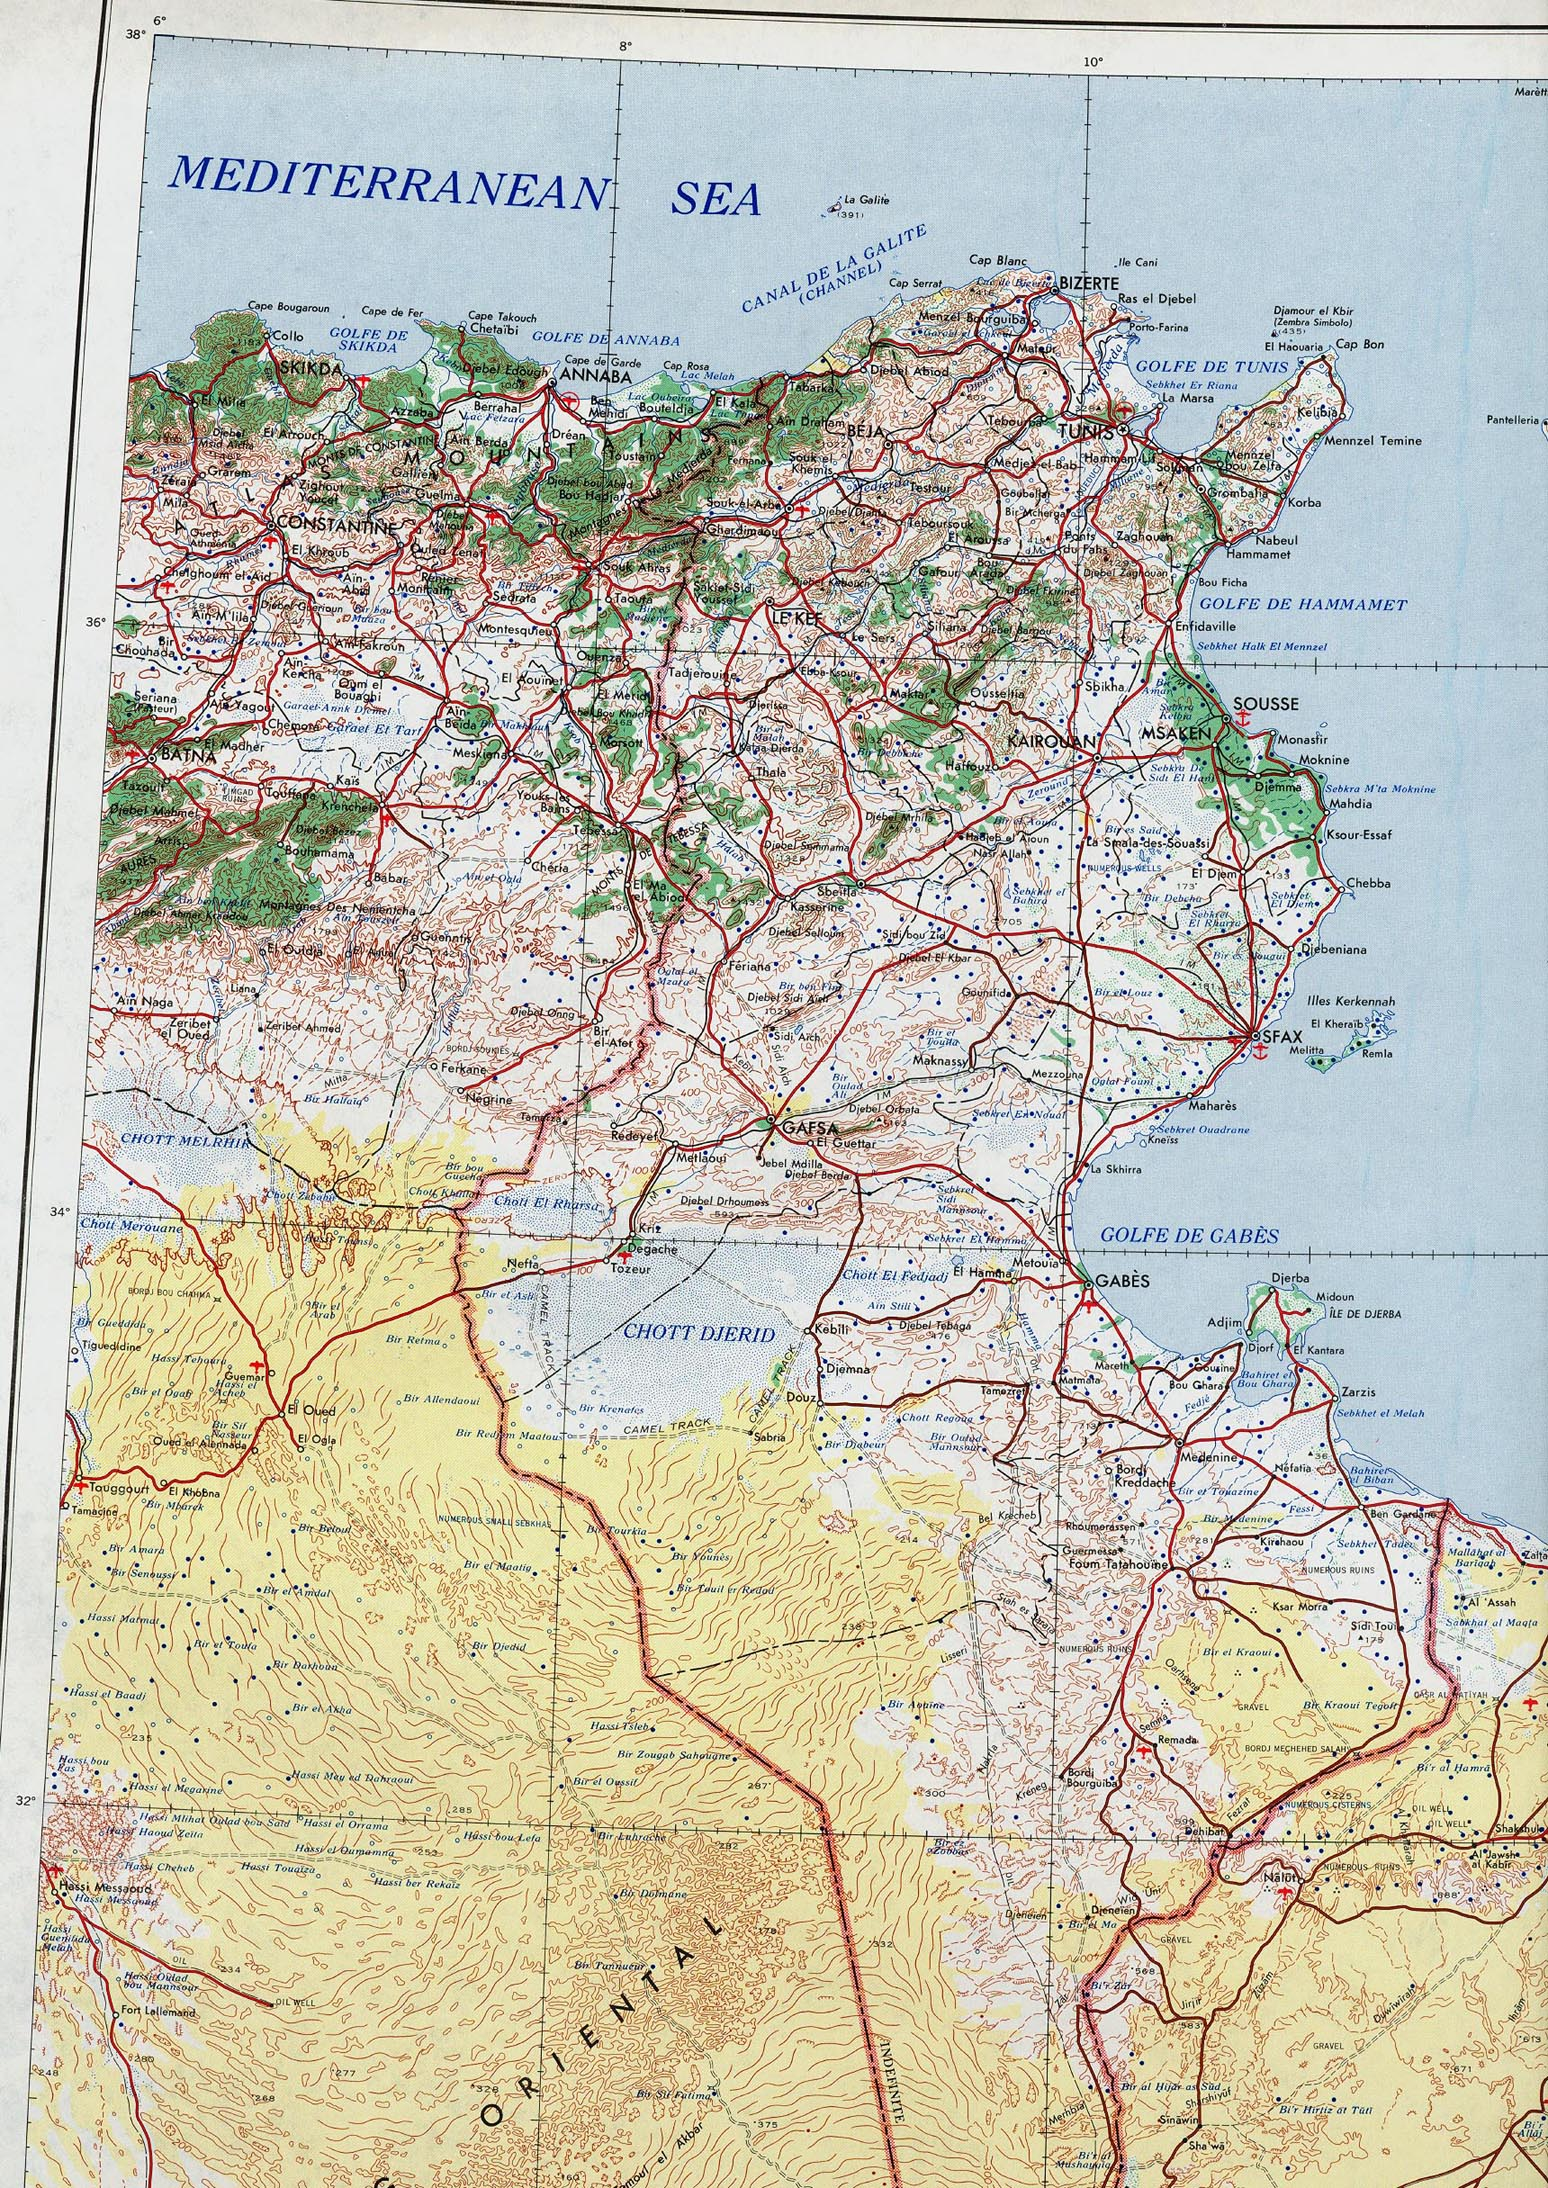 Tunesien Karte.Landkarte Tunesien 2 Mb Topographische Karte